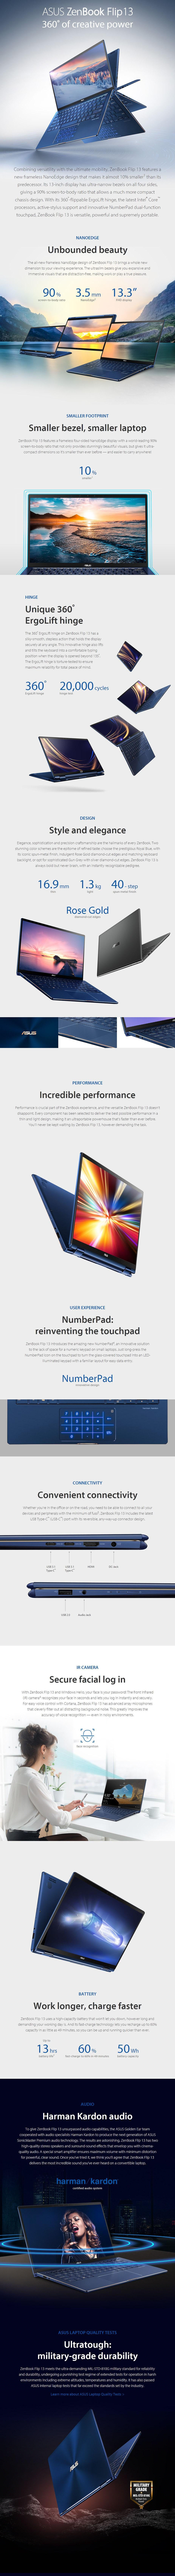 "ASUS ZenBook Flip 13 UX362FA 13.3"" Notebook i5-82665U 8GB 256GB Win10 Pro - Overview 1"